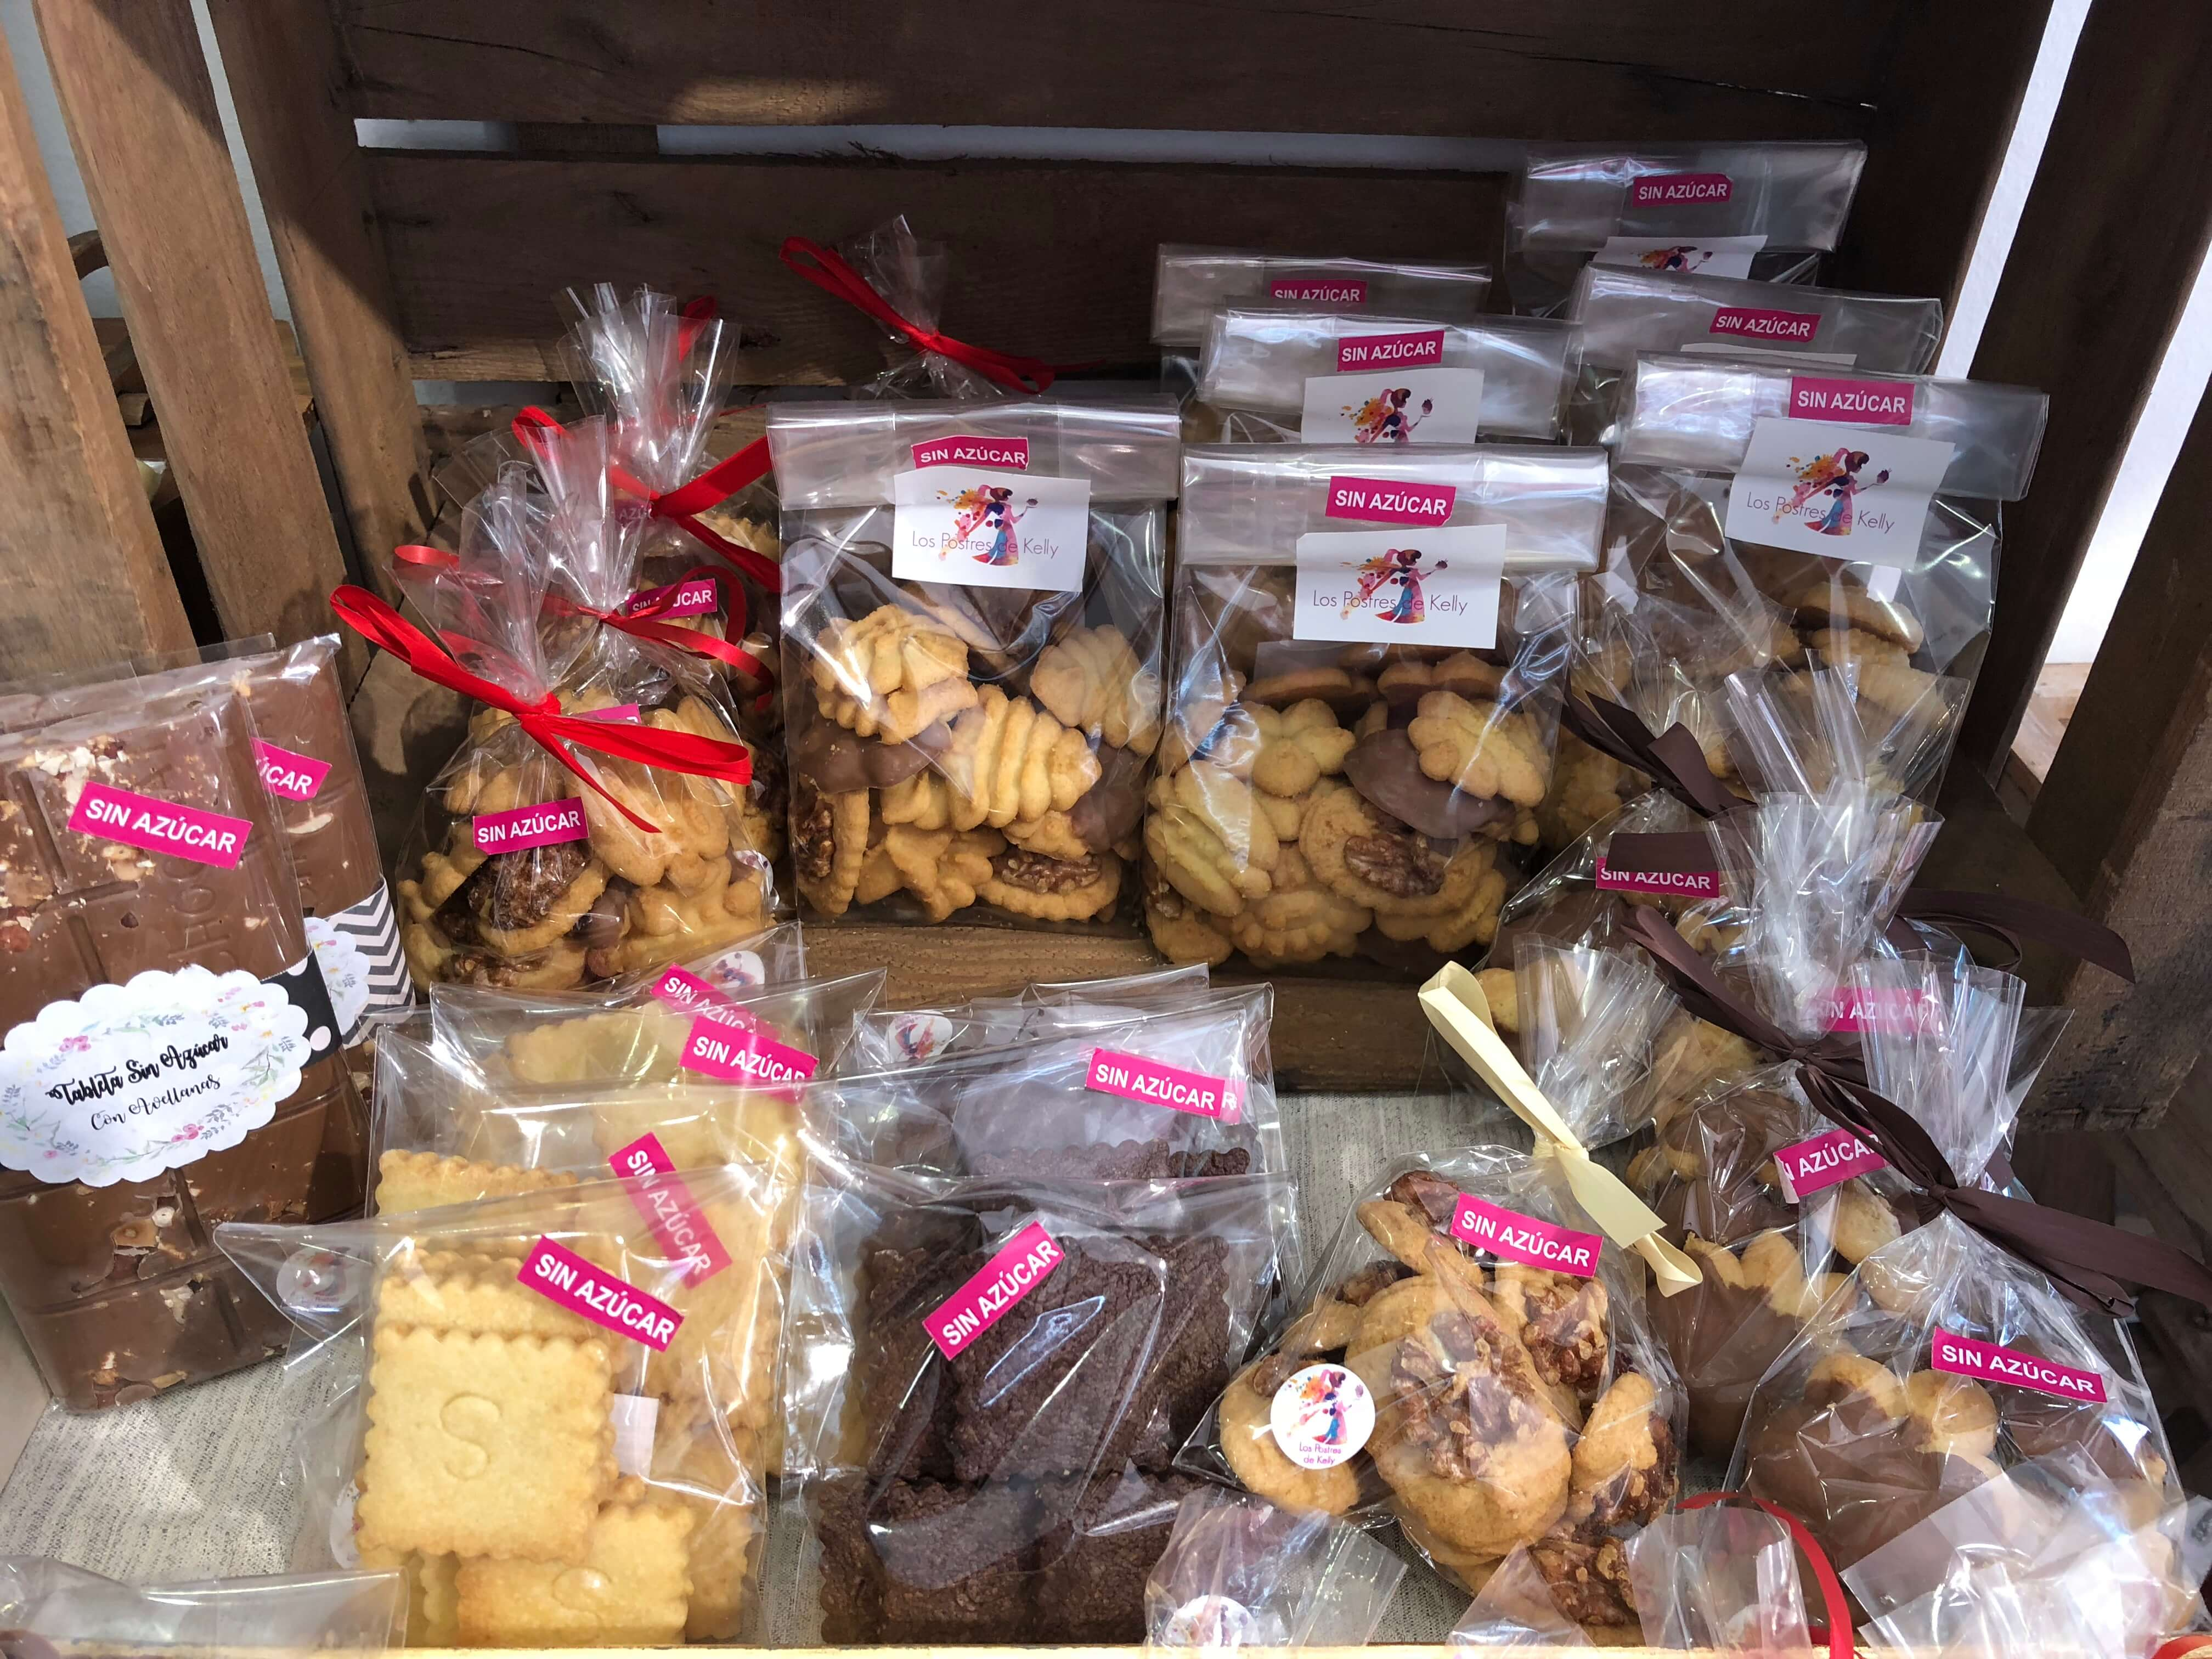 galletas sin azúcar coruña